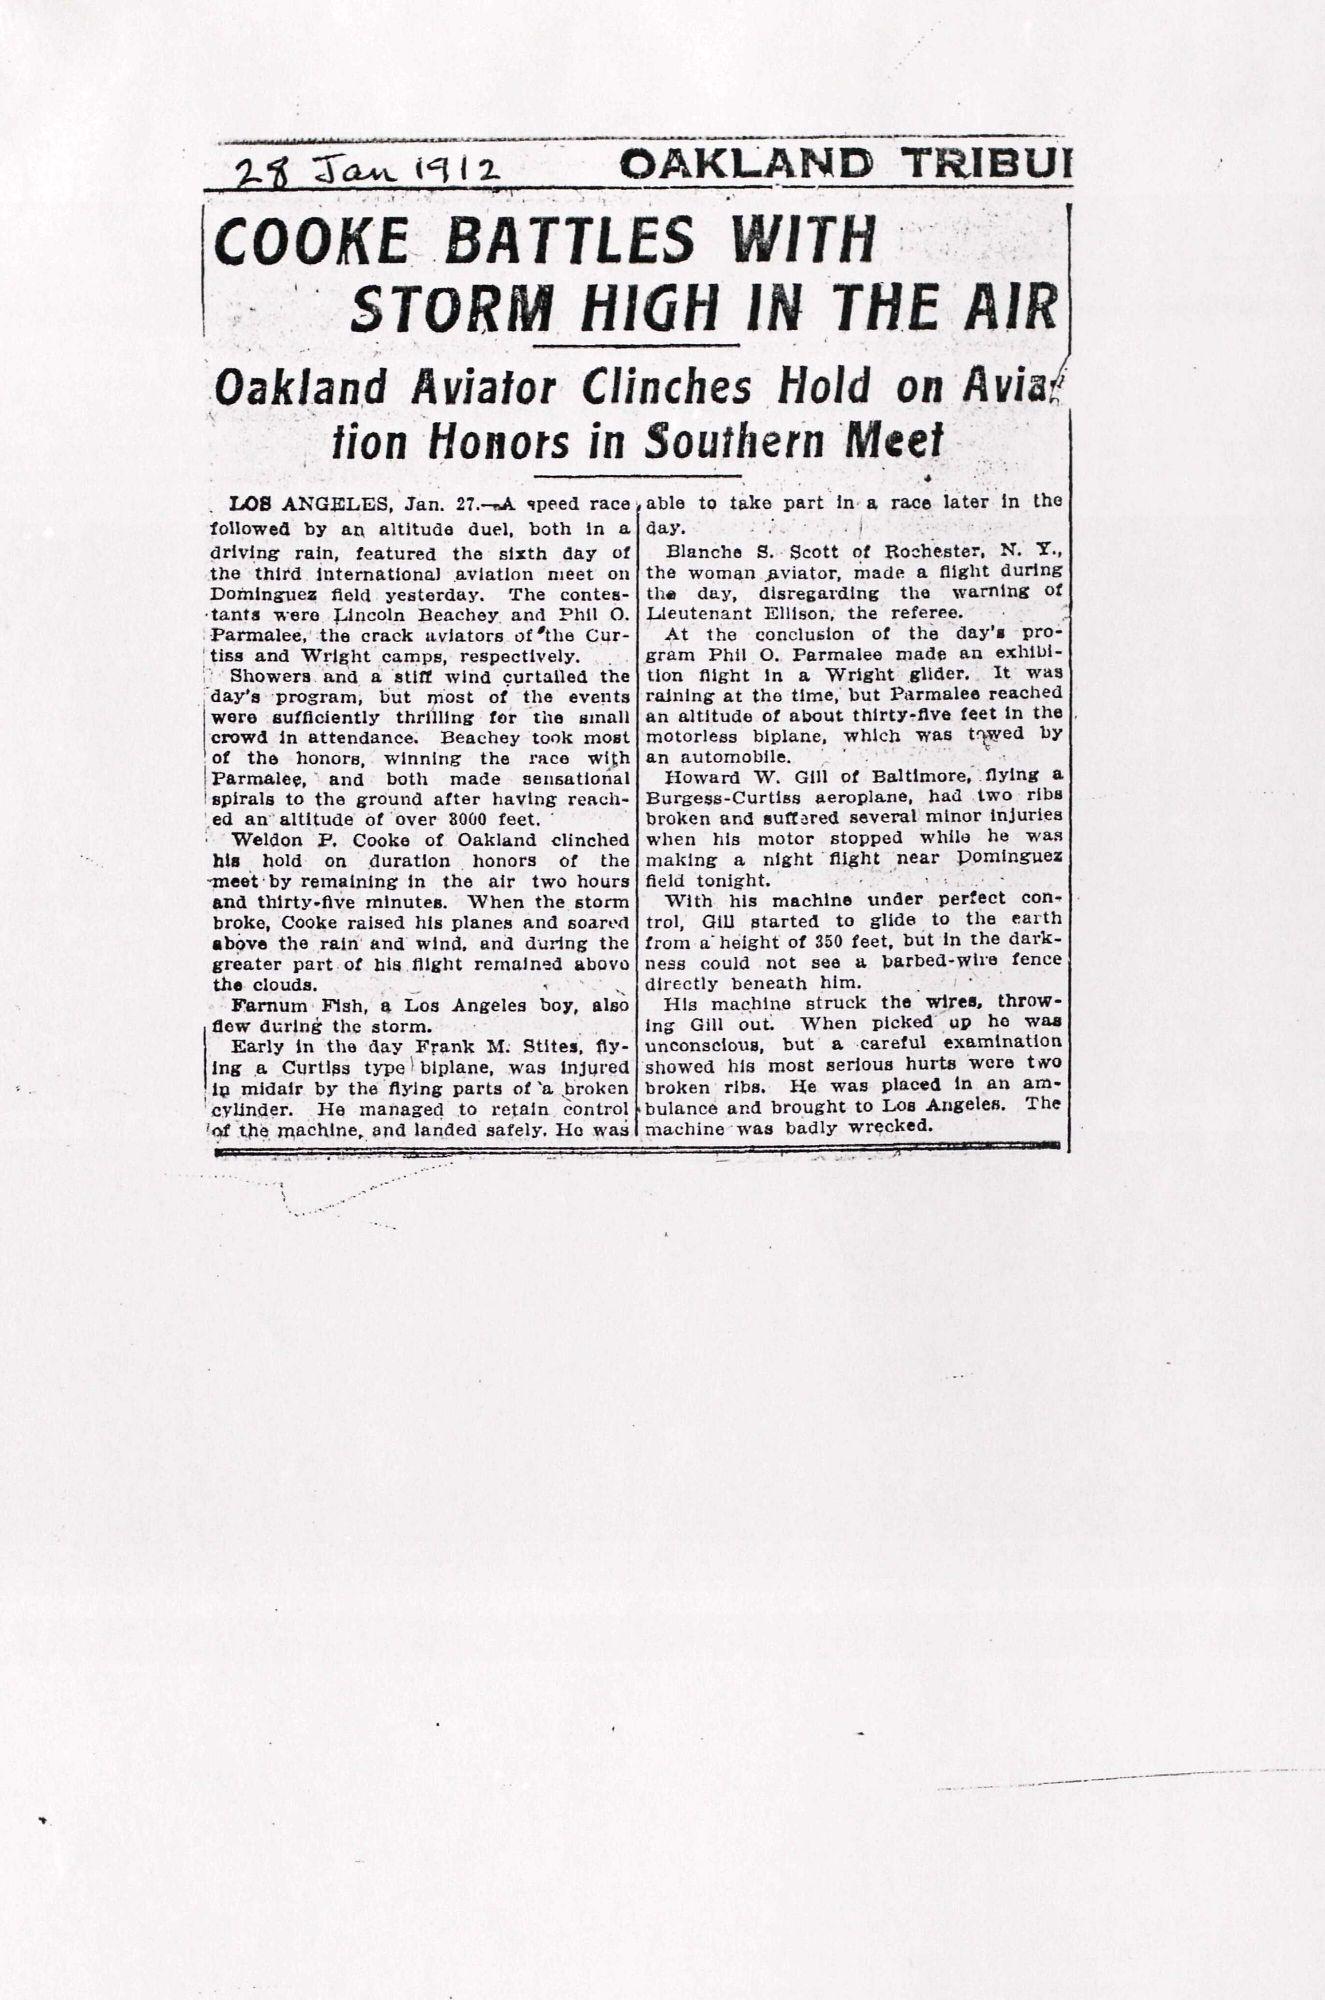 Newspaper Articles